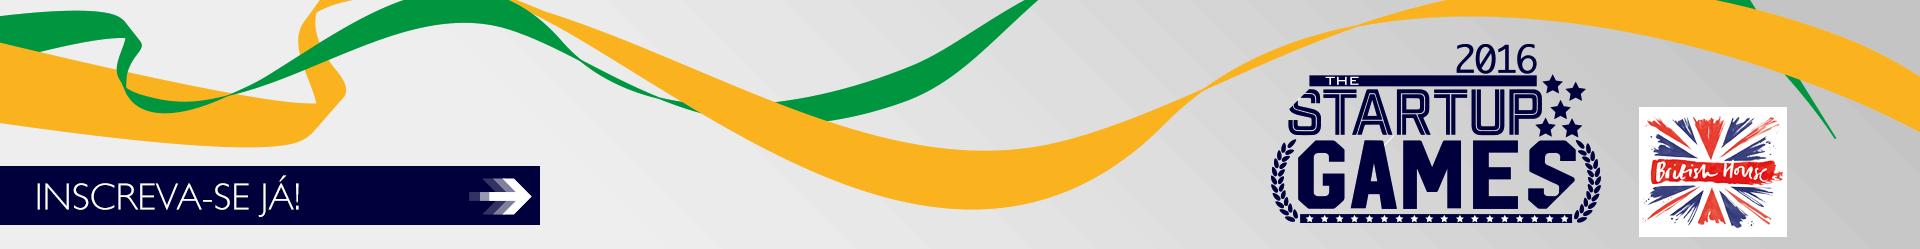 Startup Games 2016 banner